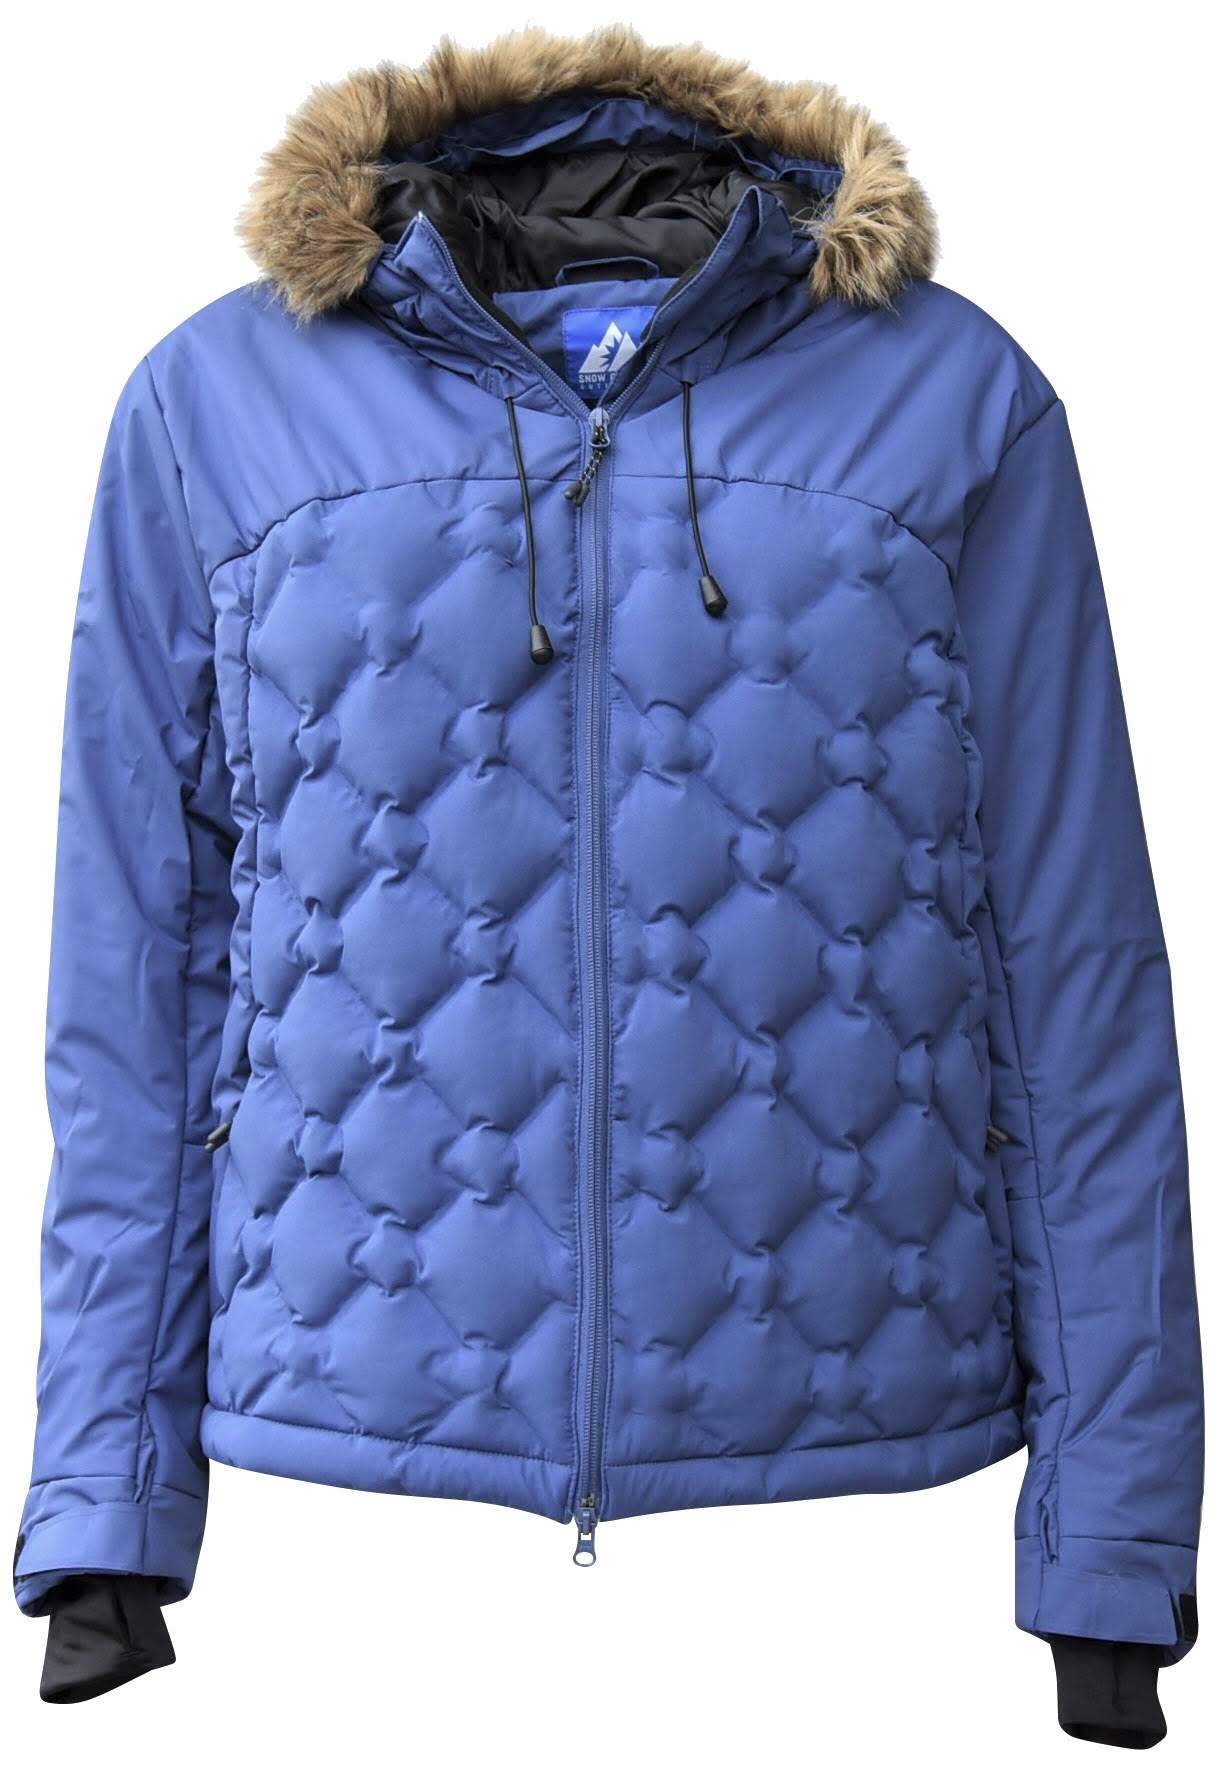 Snow Country Outerwear Women's Plus Size Hail Stone Down Alternative Coat Jacket